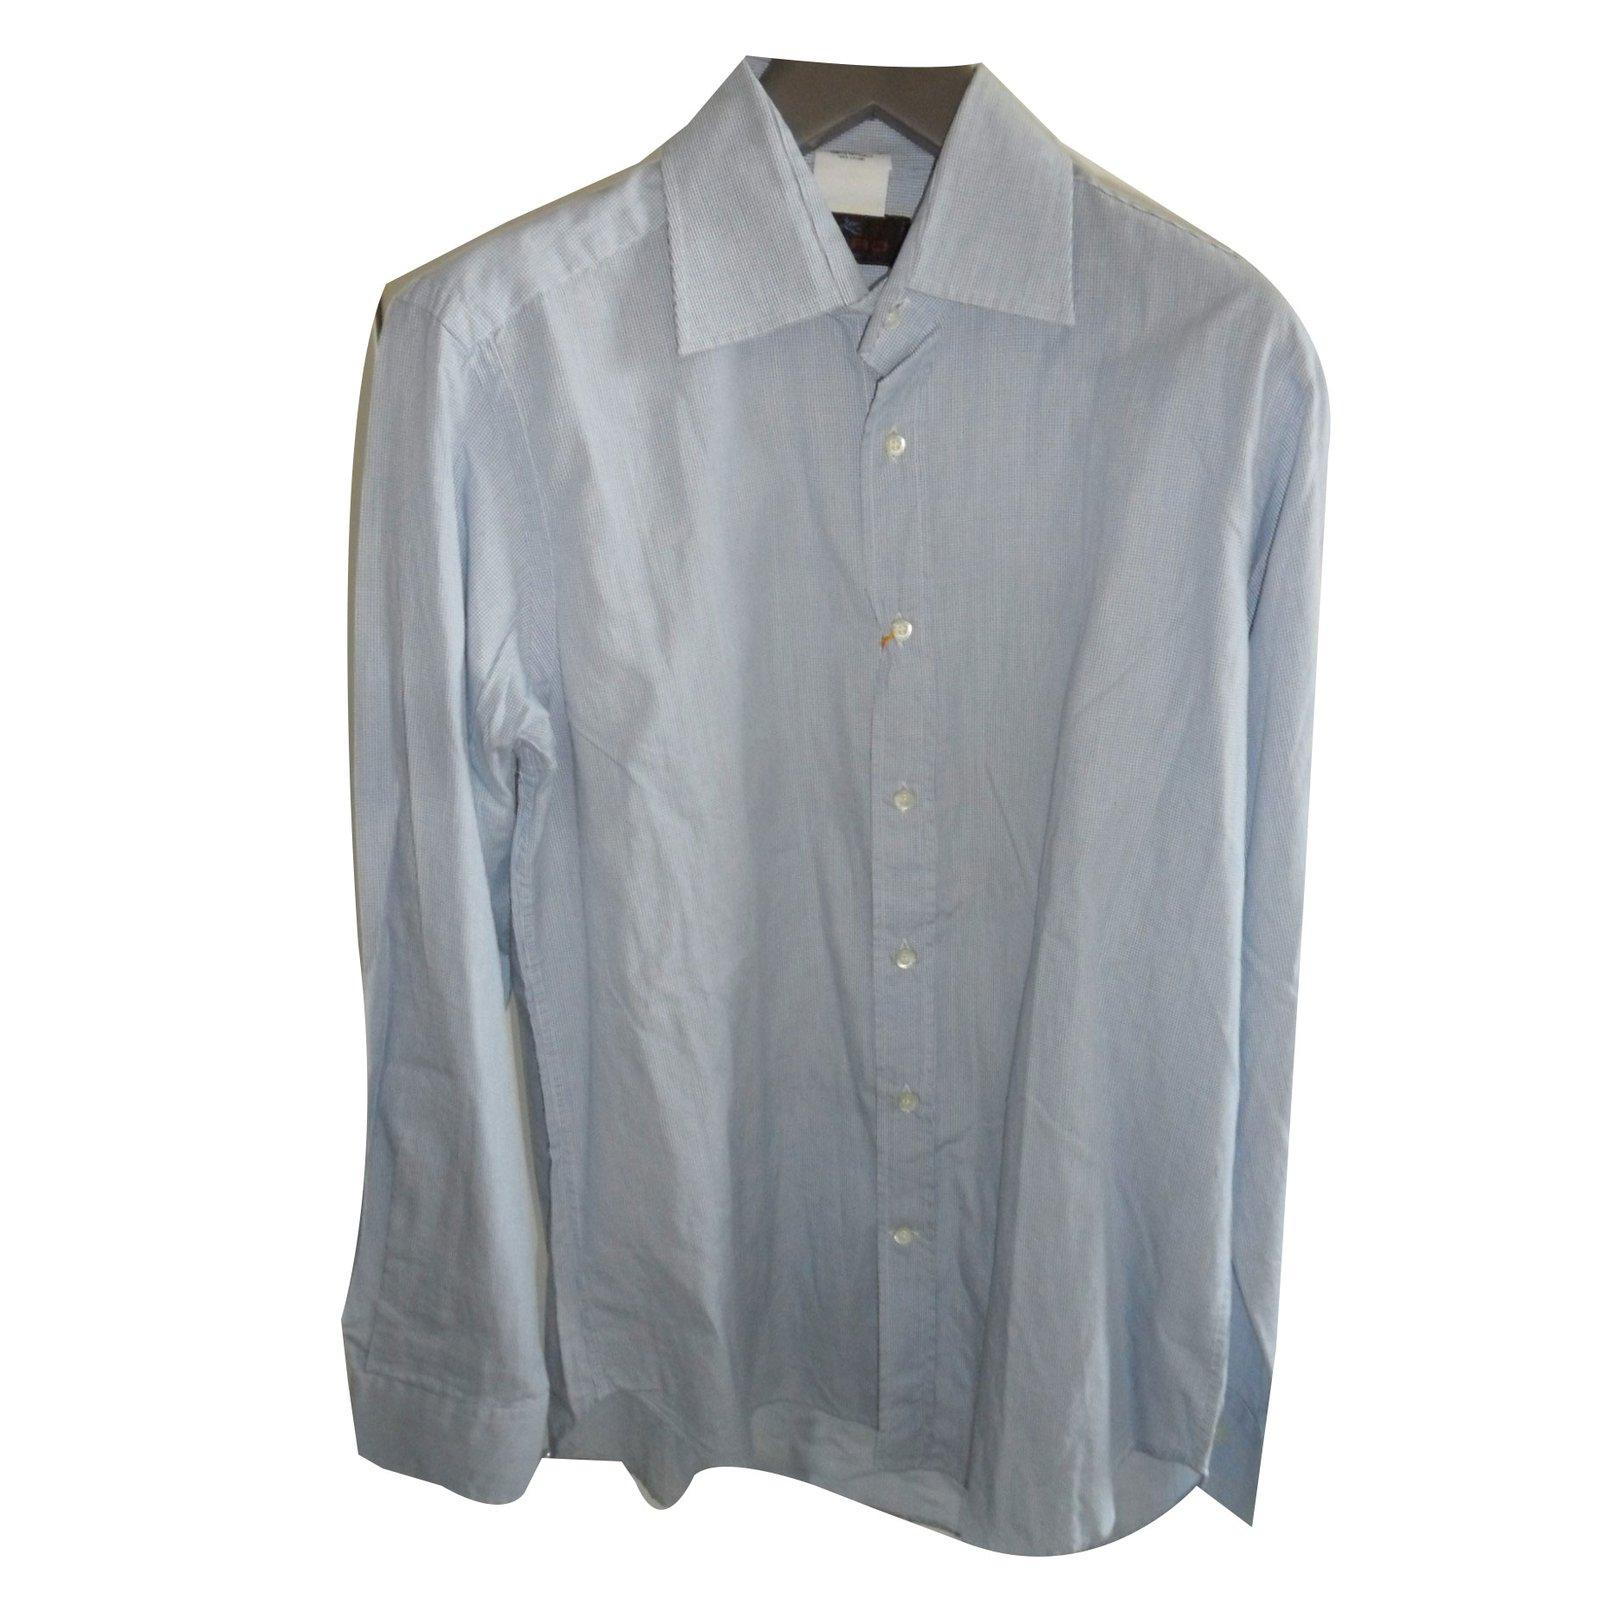 Etro etro new men 39 s shirt with parrot print shirts cotton for Etro men s shirts